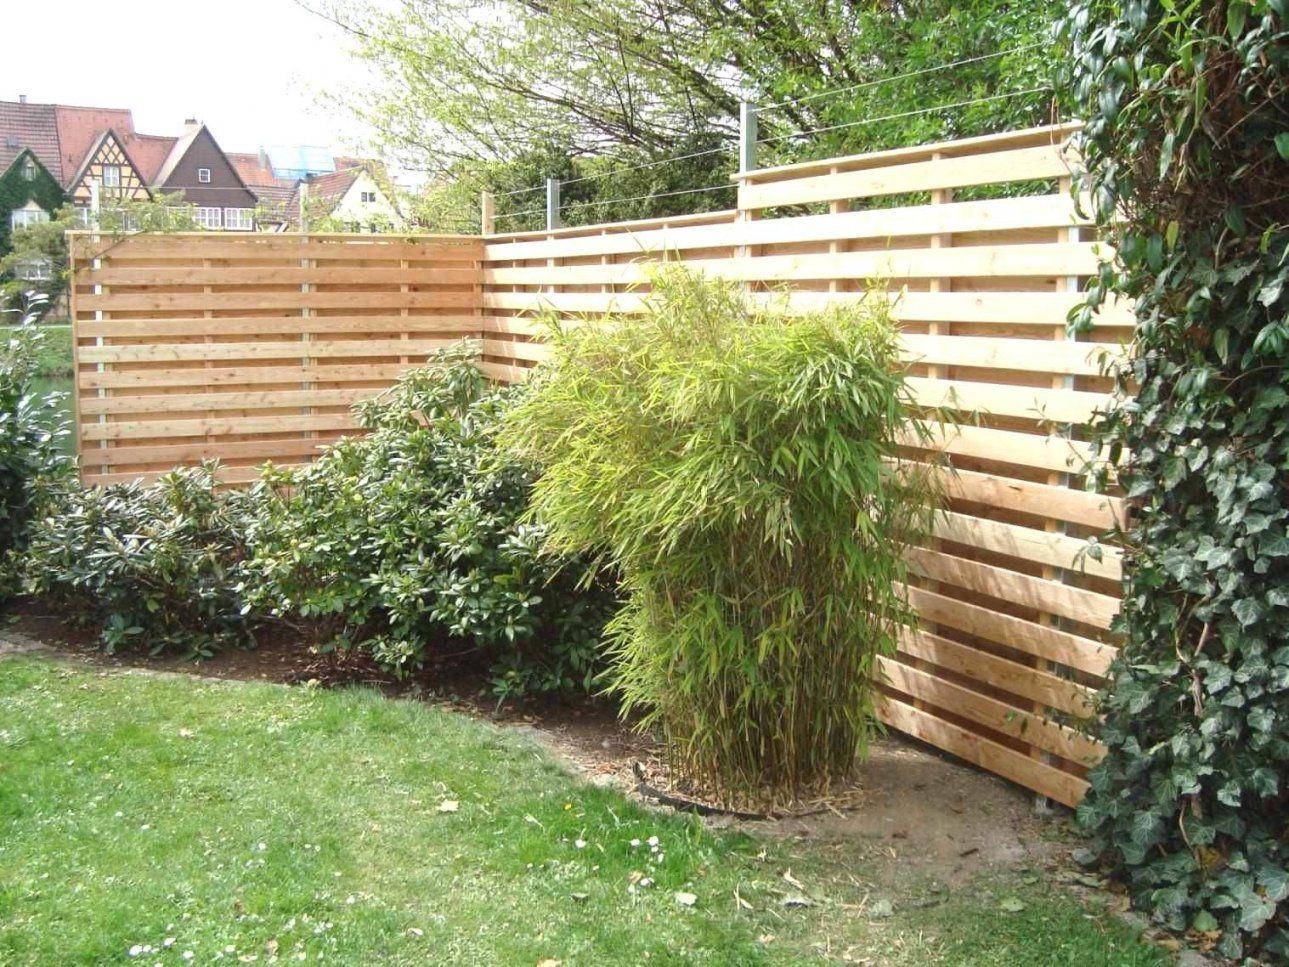 Holz Deko Garten Selber Machen Atemberaubend Tolle 40 Sichtschutz von Sichtschutz Selber Machen Günstig Photo